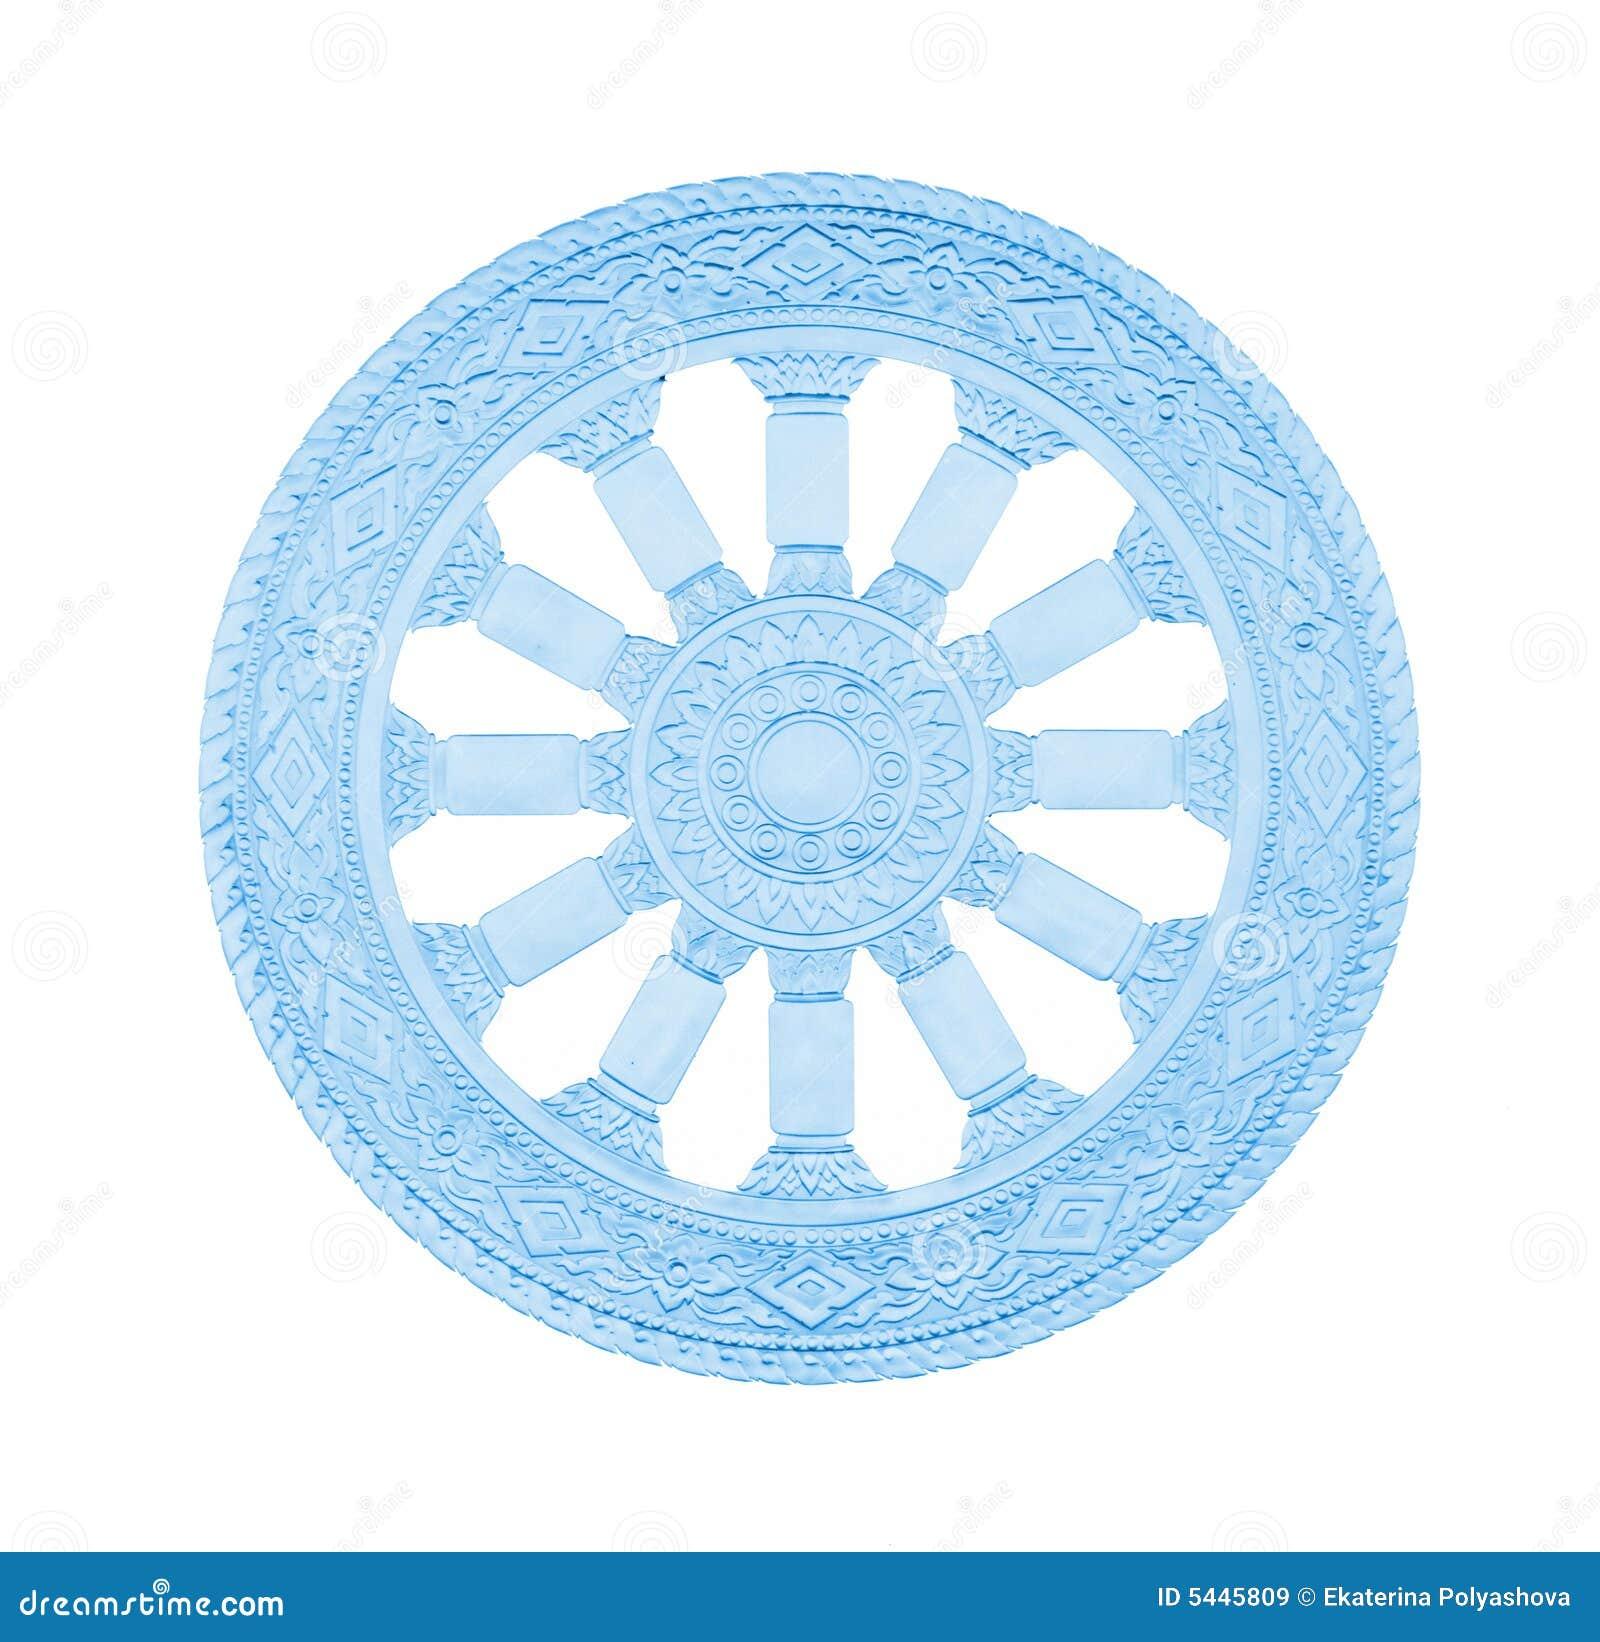 Buddhismus Symbol Rad Des Lebens Stockbild Bild Von Hingabe